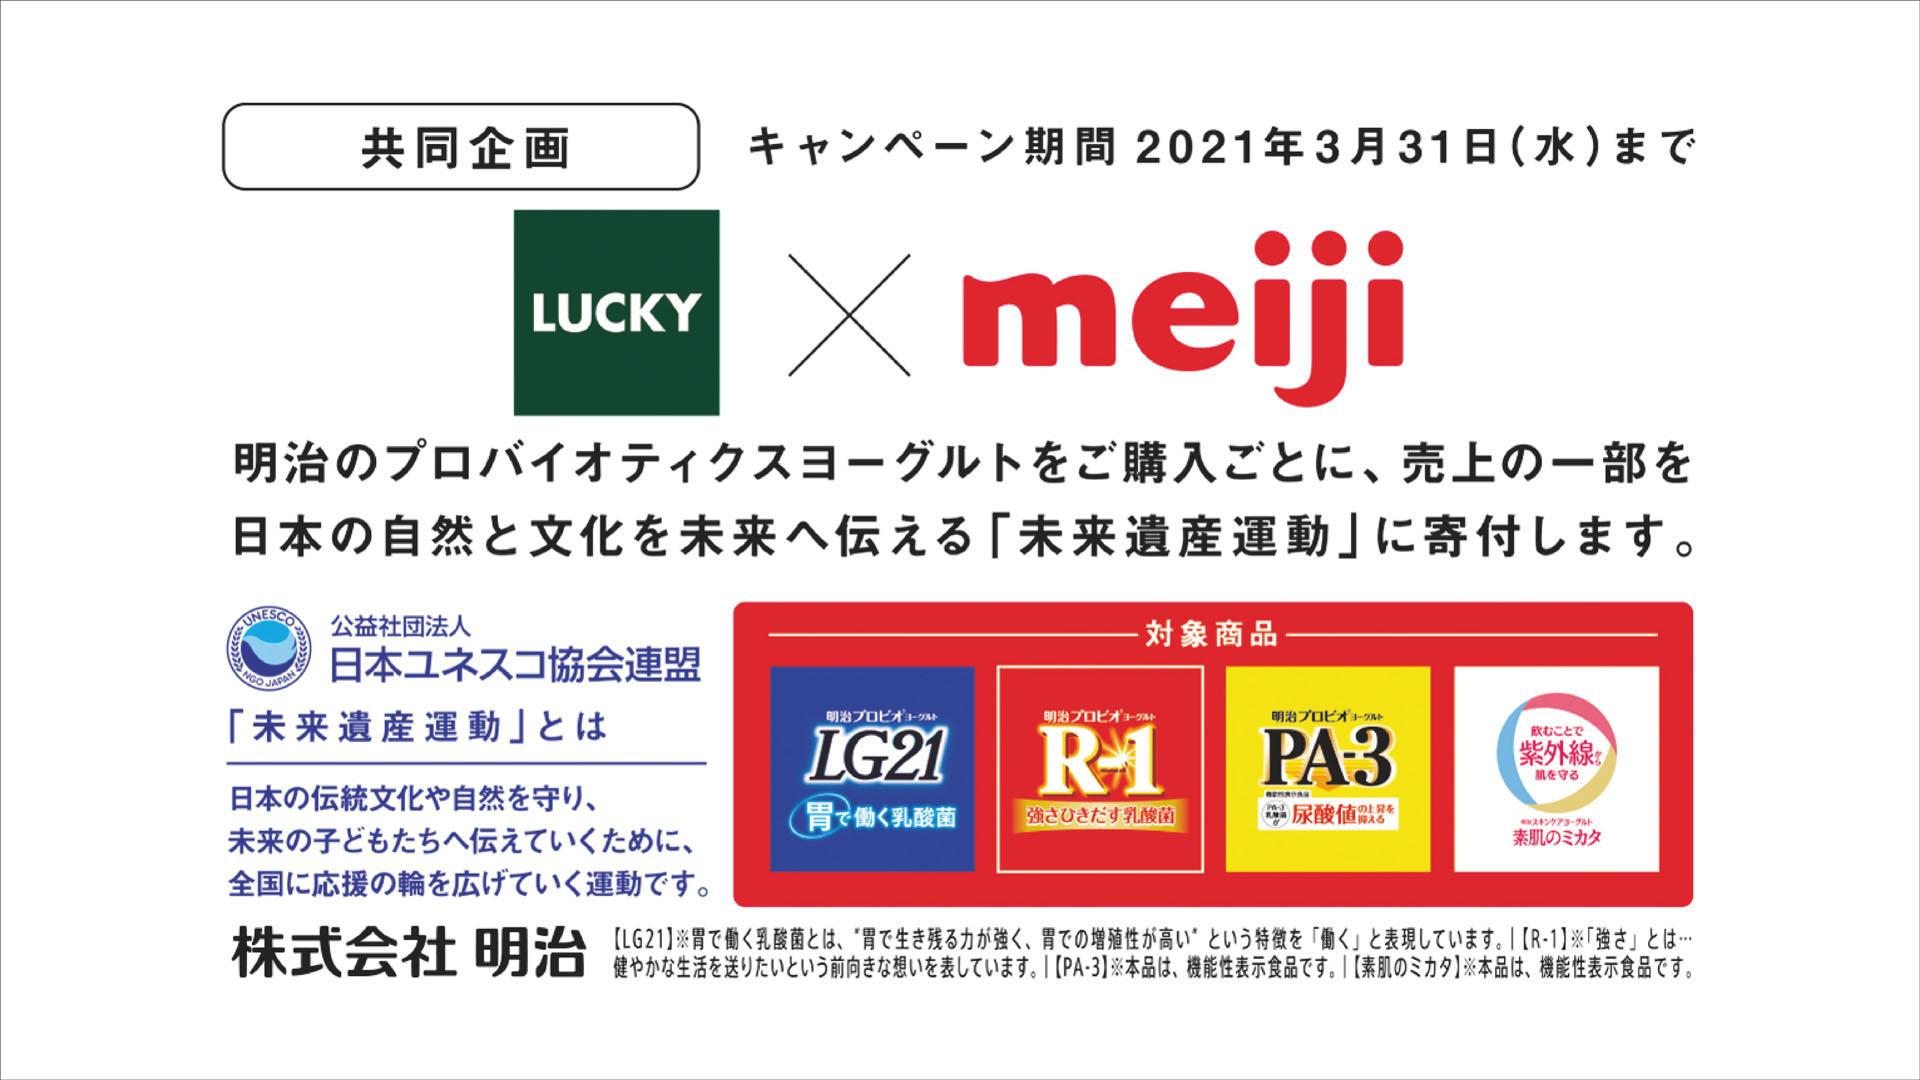 LUCKY×meiji共同企画「未来遺産運動」に寄付します